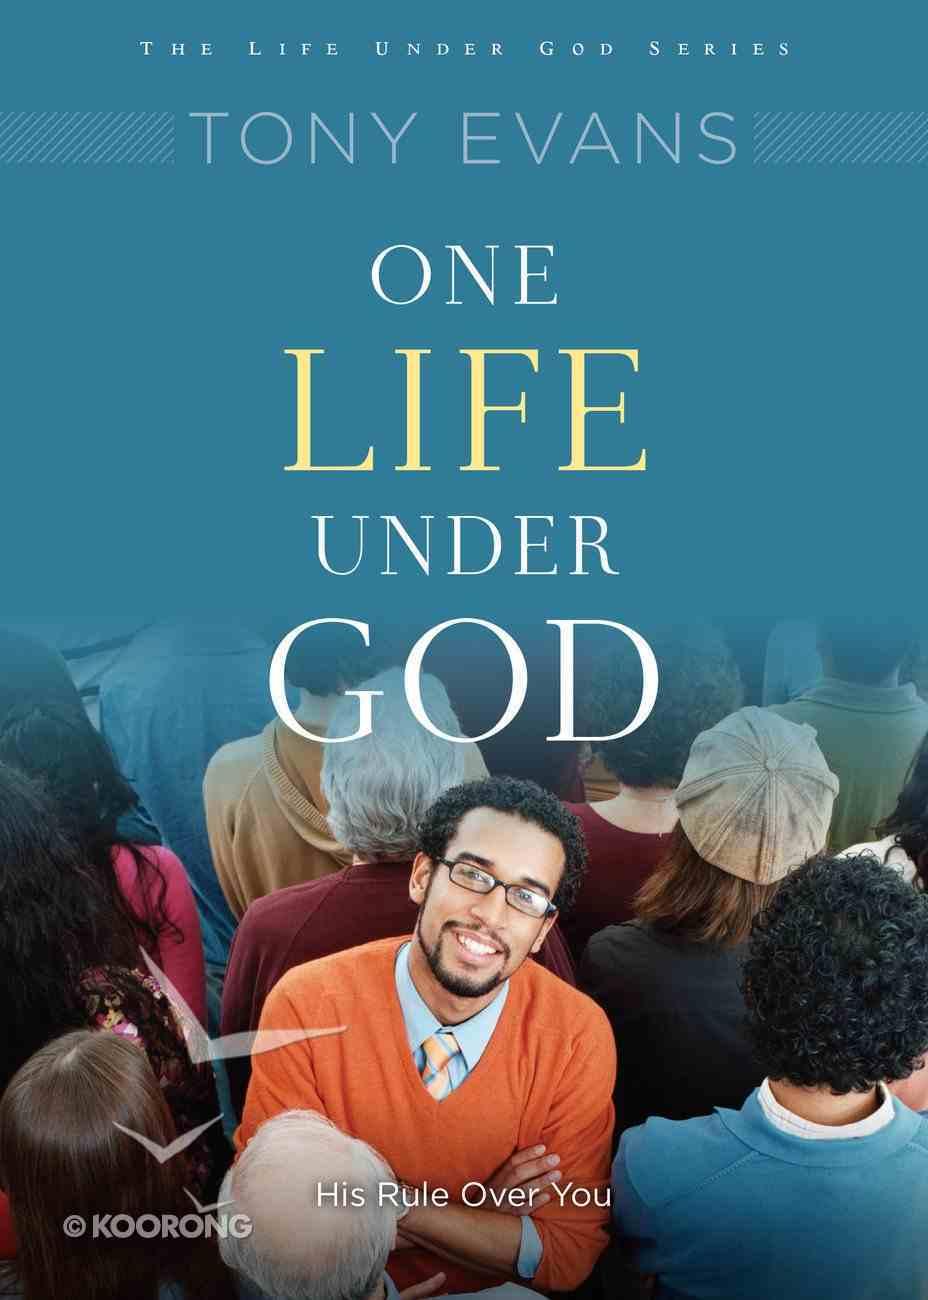 One Life Under God (Under God Series) eBook